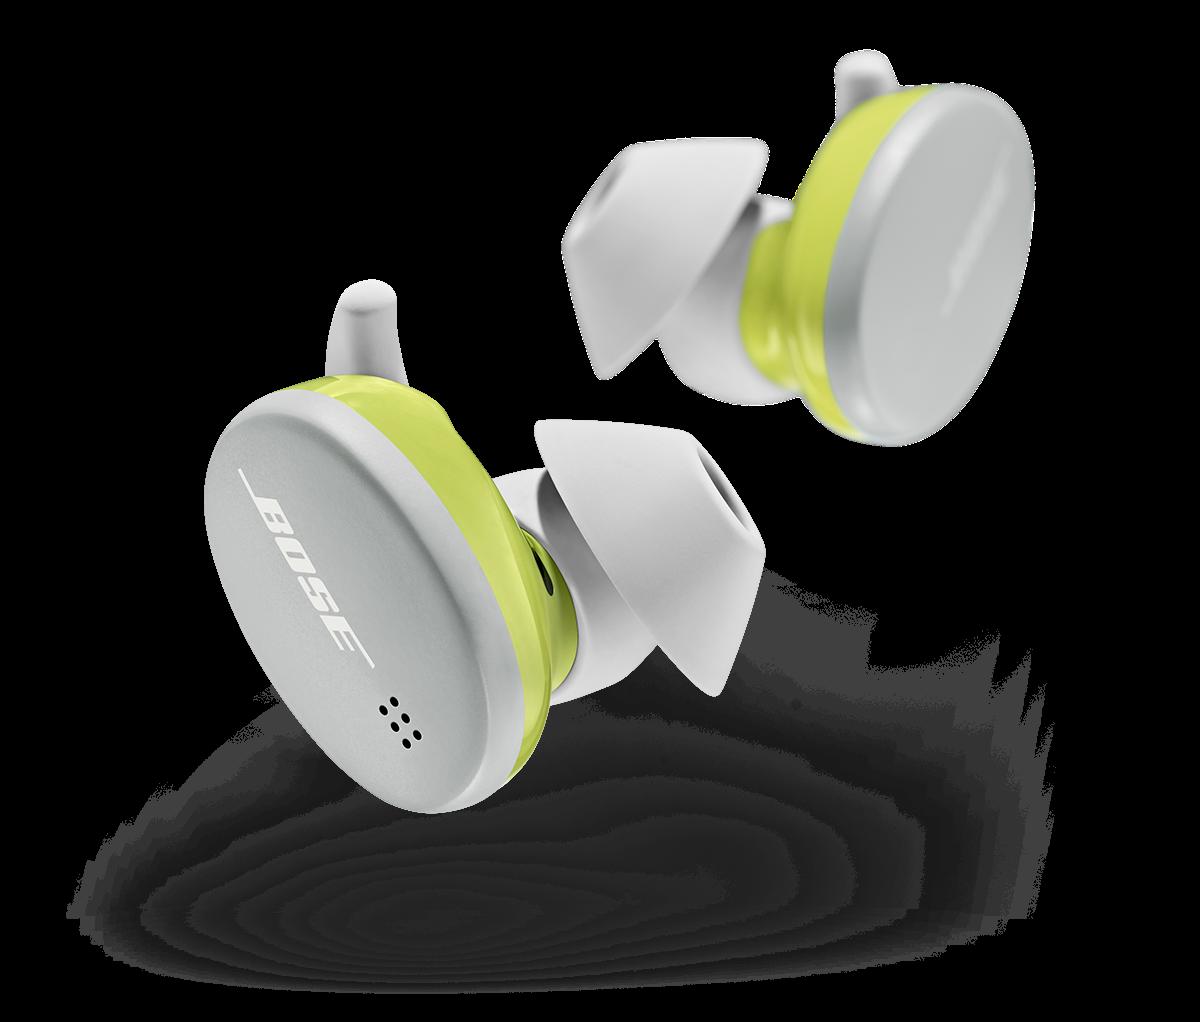 Bose Sport Earbuds Glacier White 805746-0030